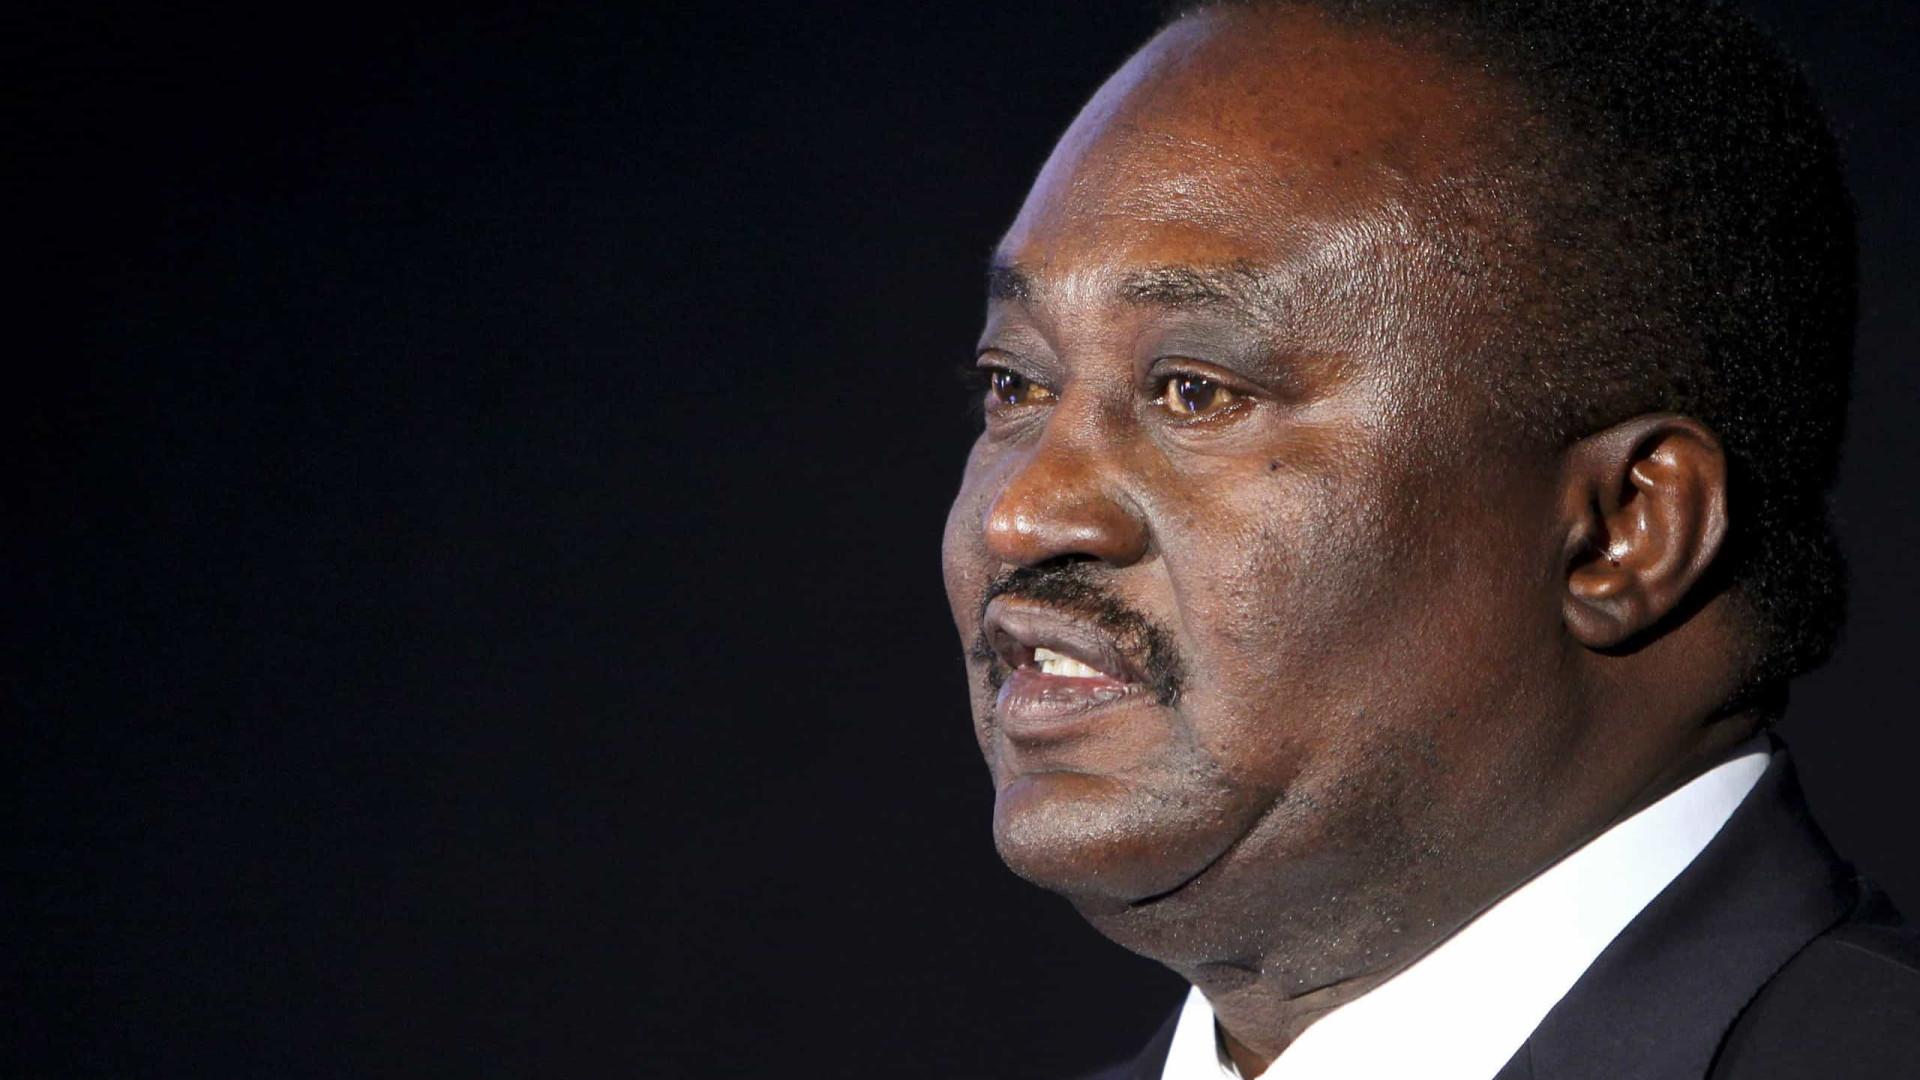 Presidente do parlamento angolano nega envolvimento no caso BESA